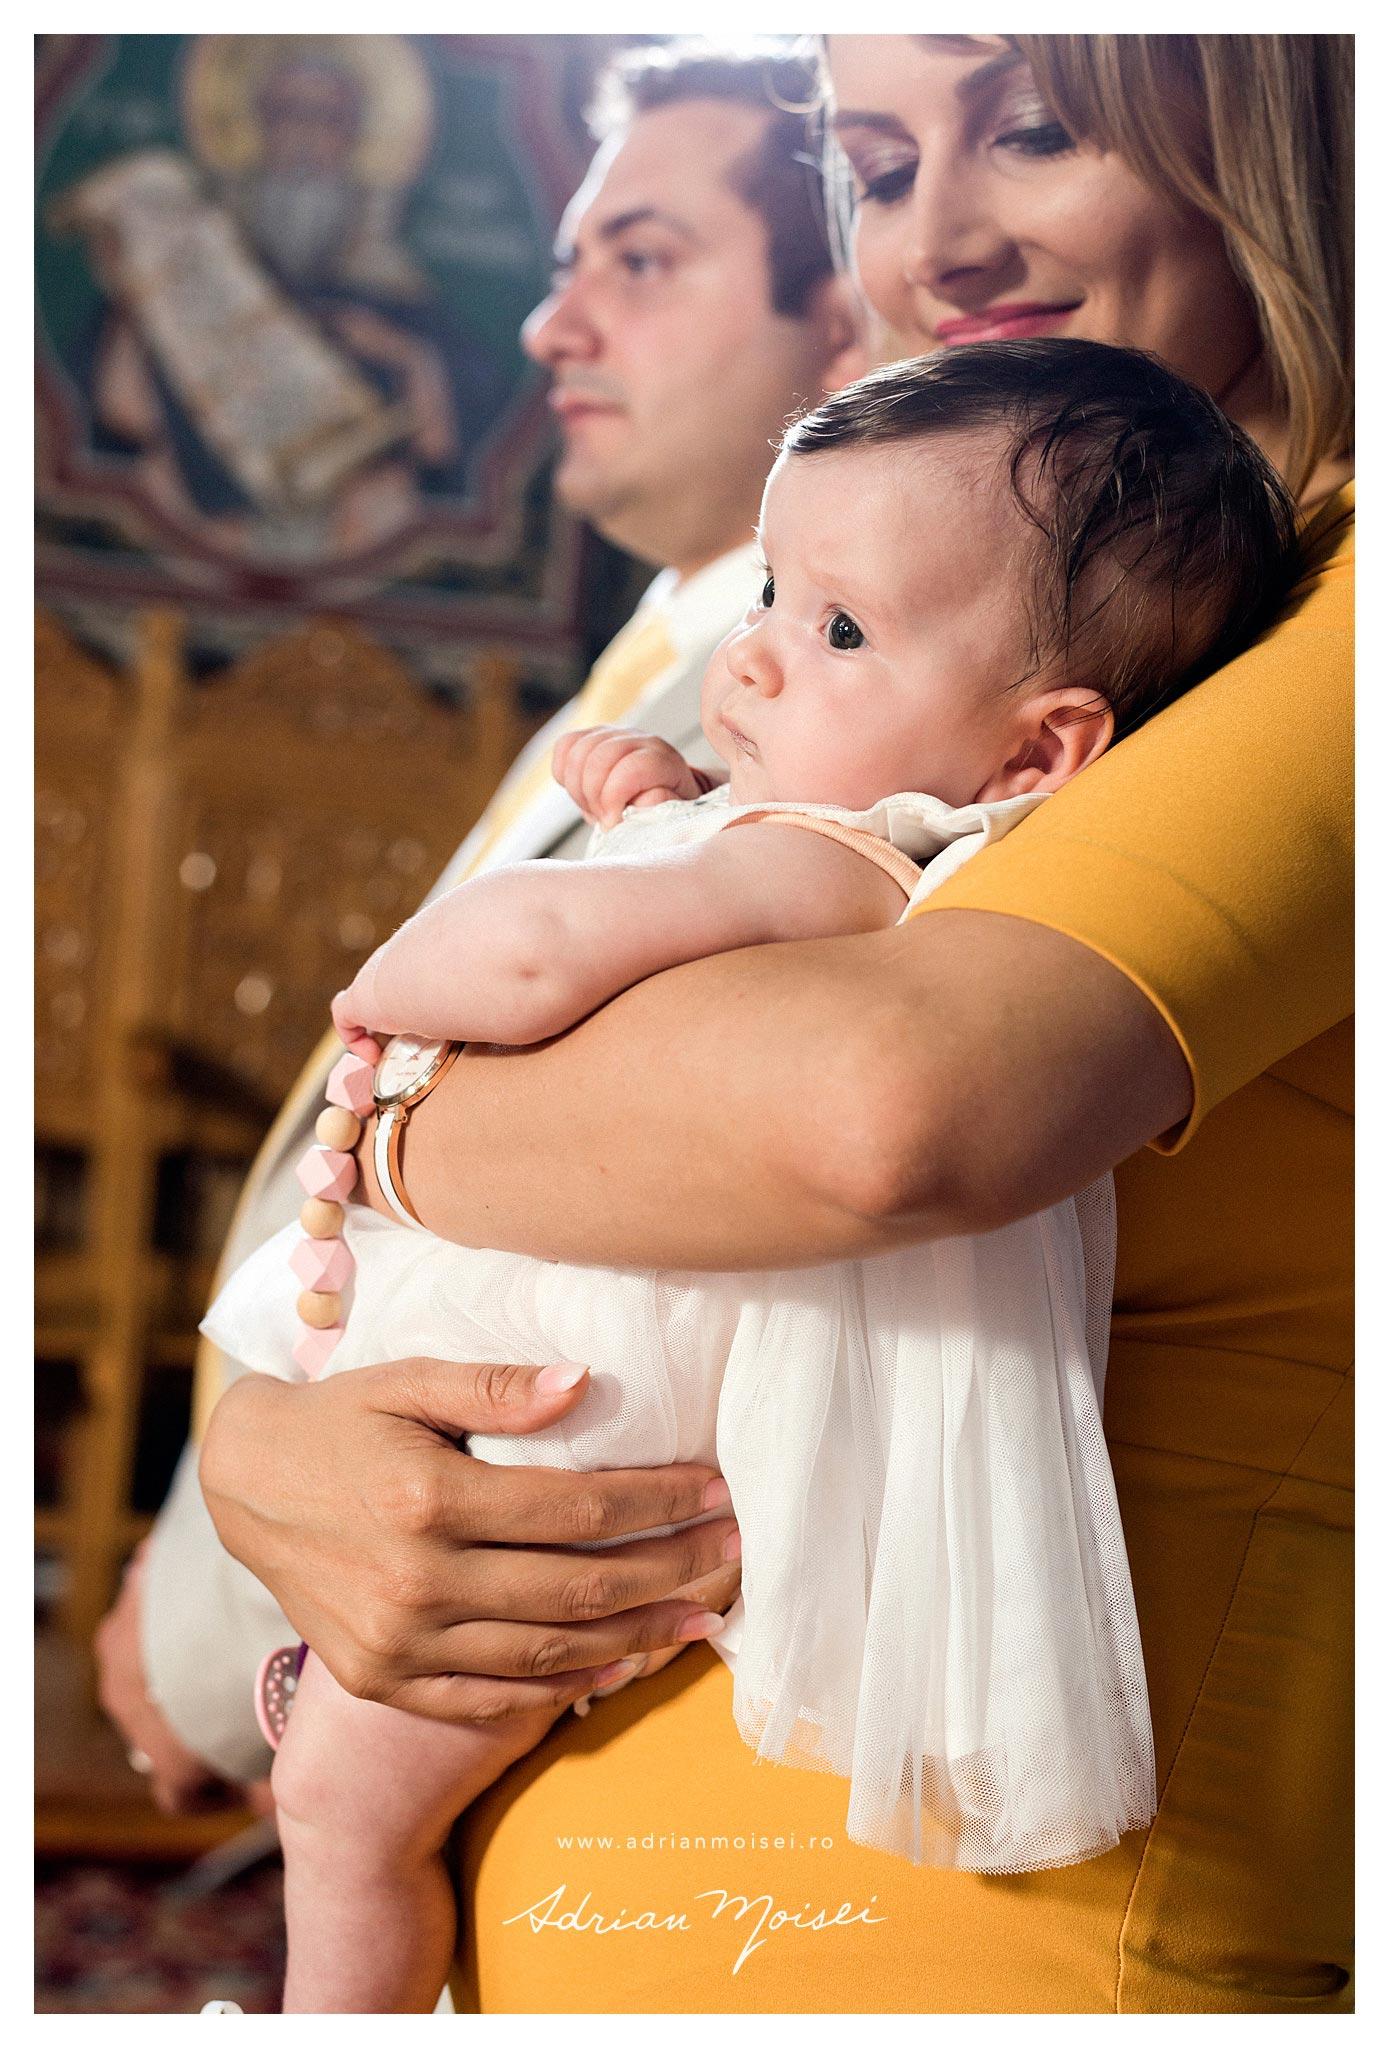 Portret de bebelus in bratele nanei, la botez, fotografie de Adrian Moisei